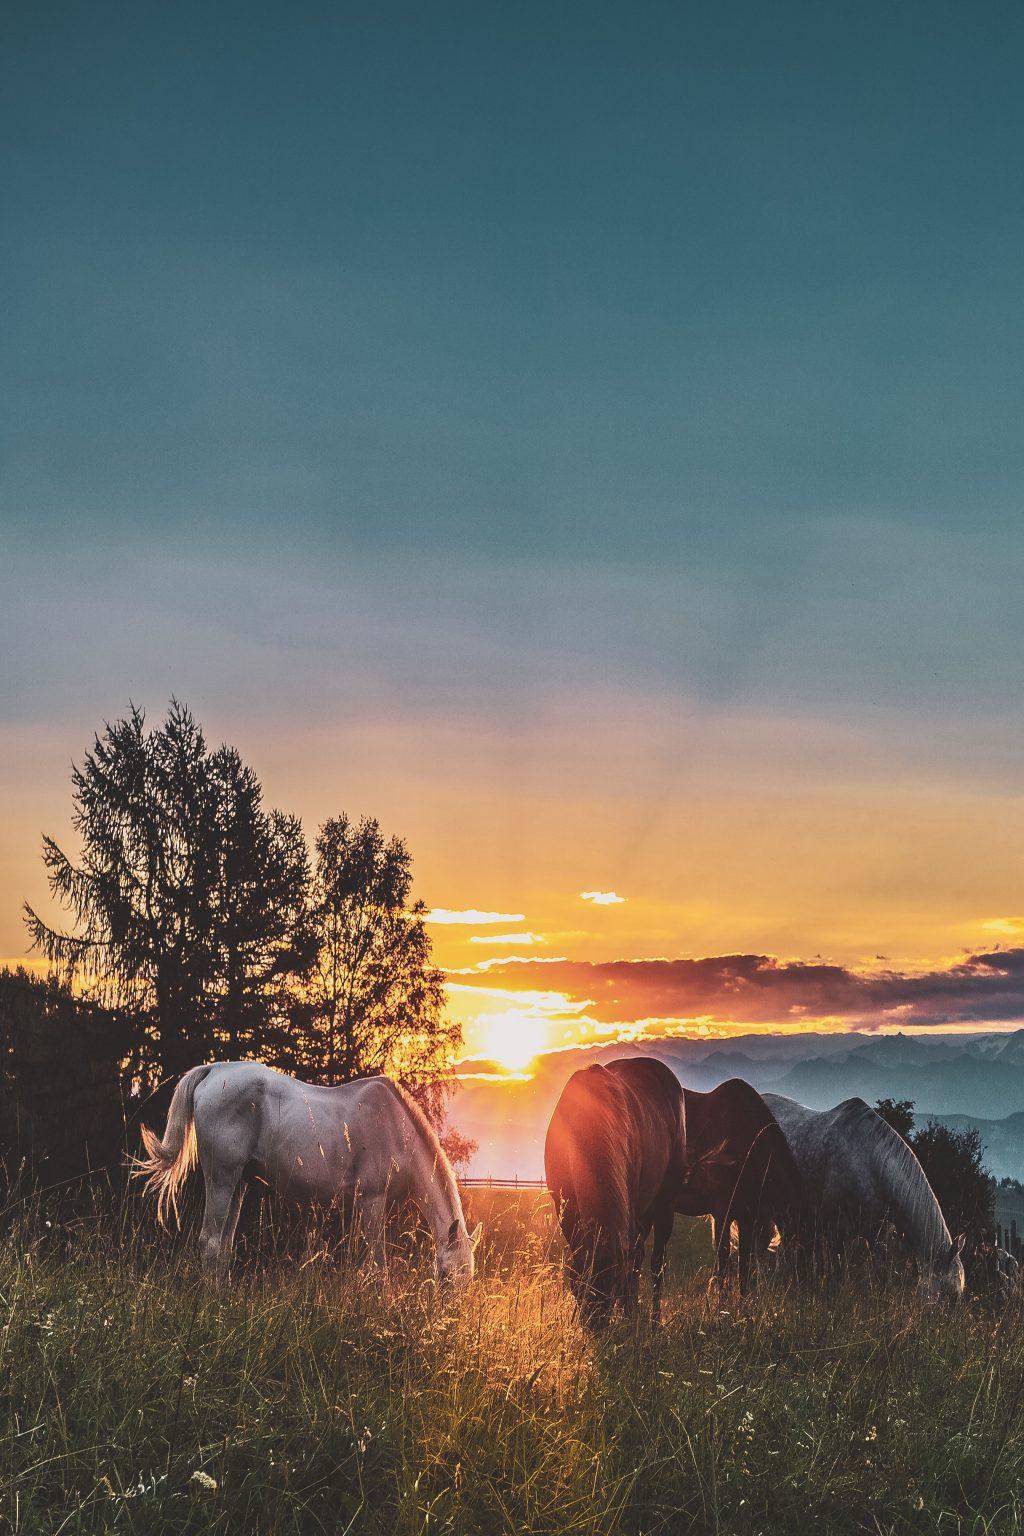 rando-equestre-kirghizstan-rockbeergasoline